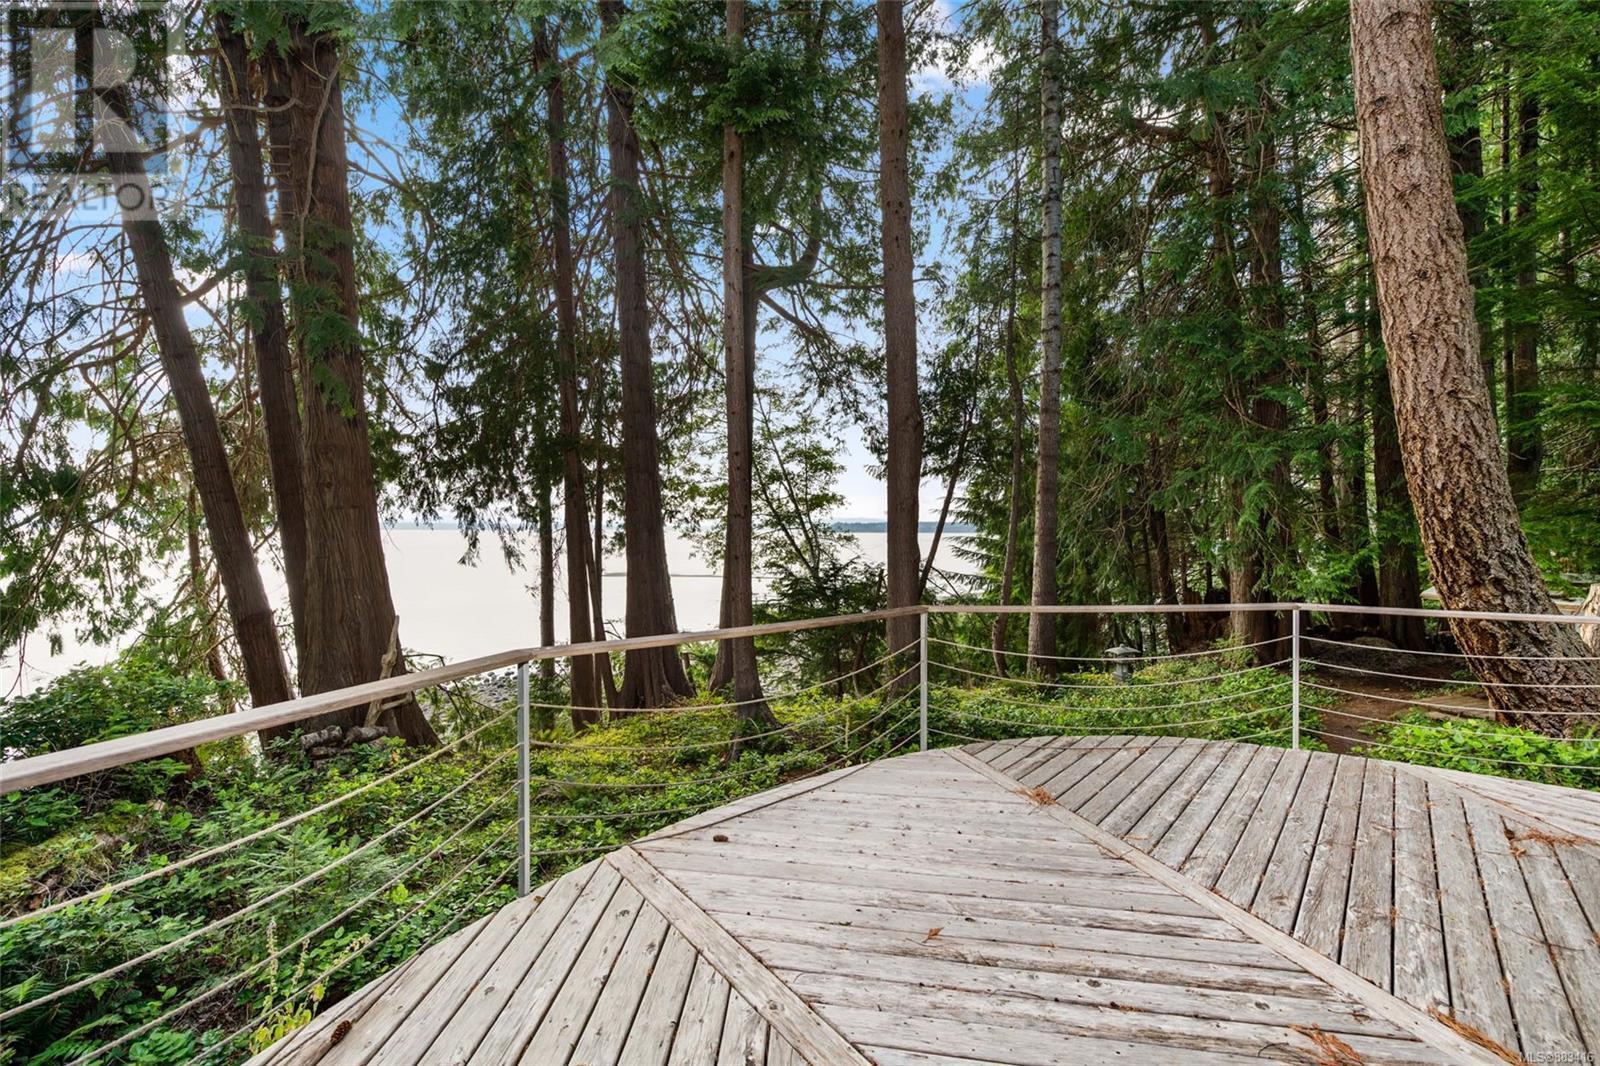 309 Sutil Point RdCortes Island, British Columbia  V0P 1K0 - Photo 44 - 883416